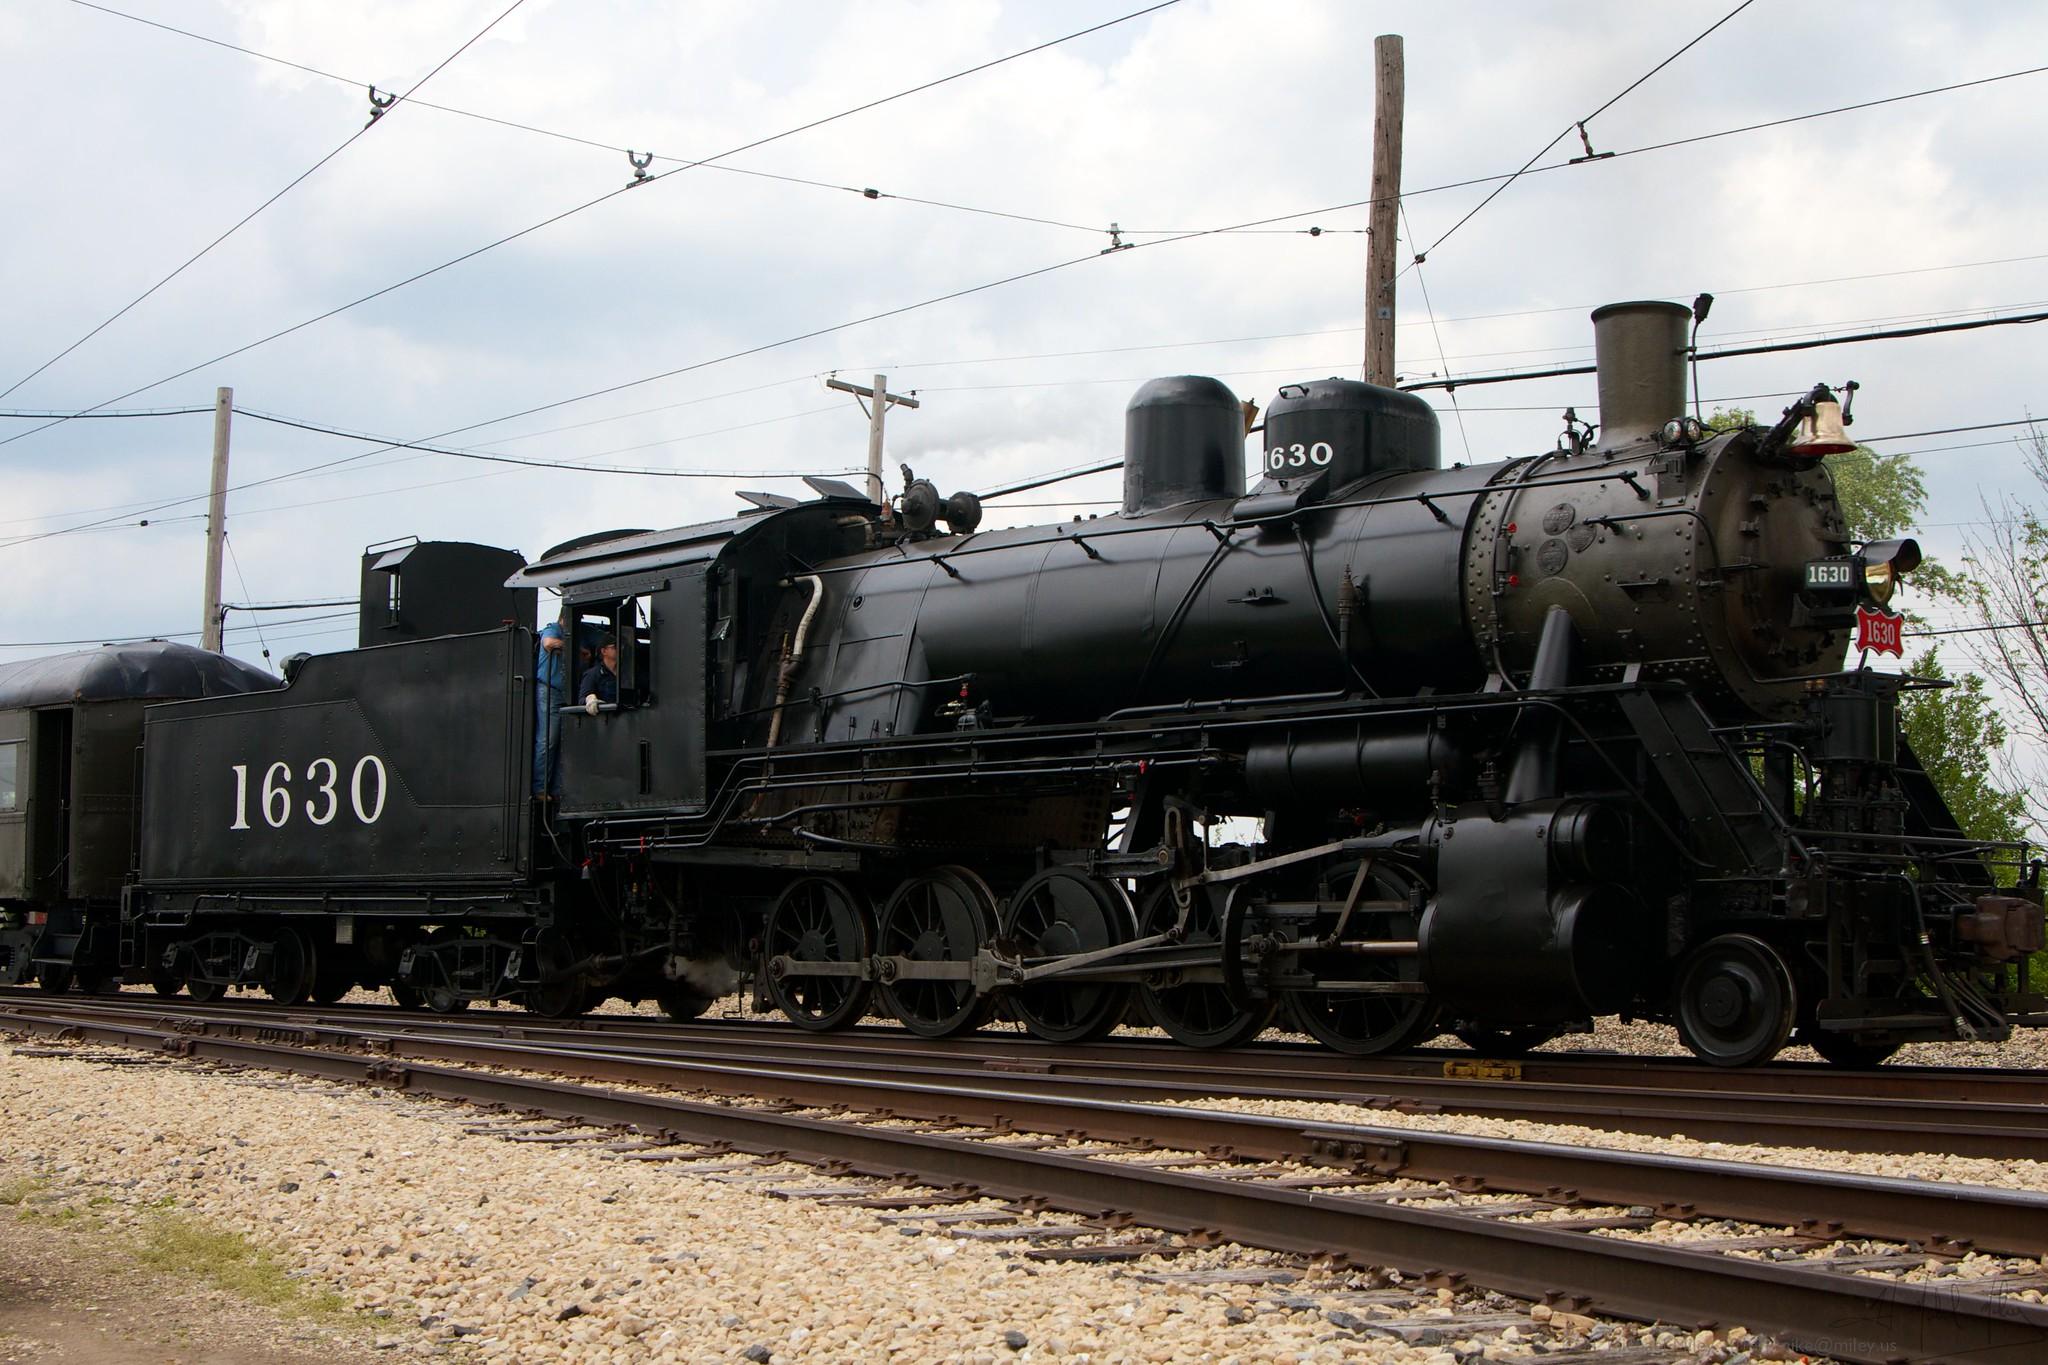 1630 Return to Service